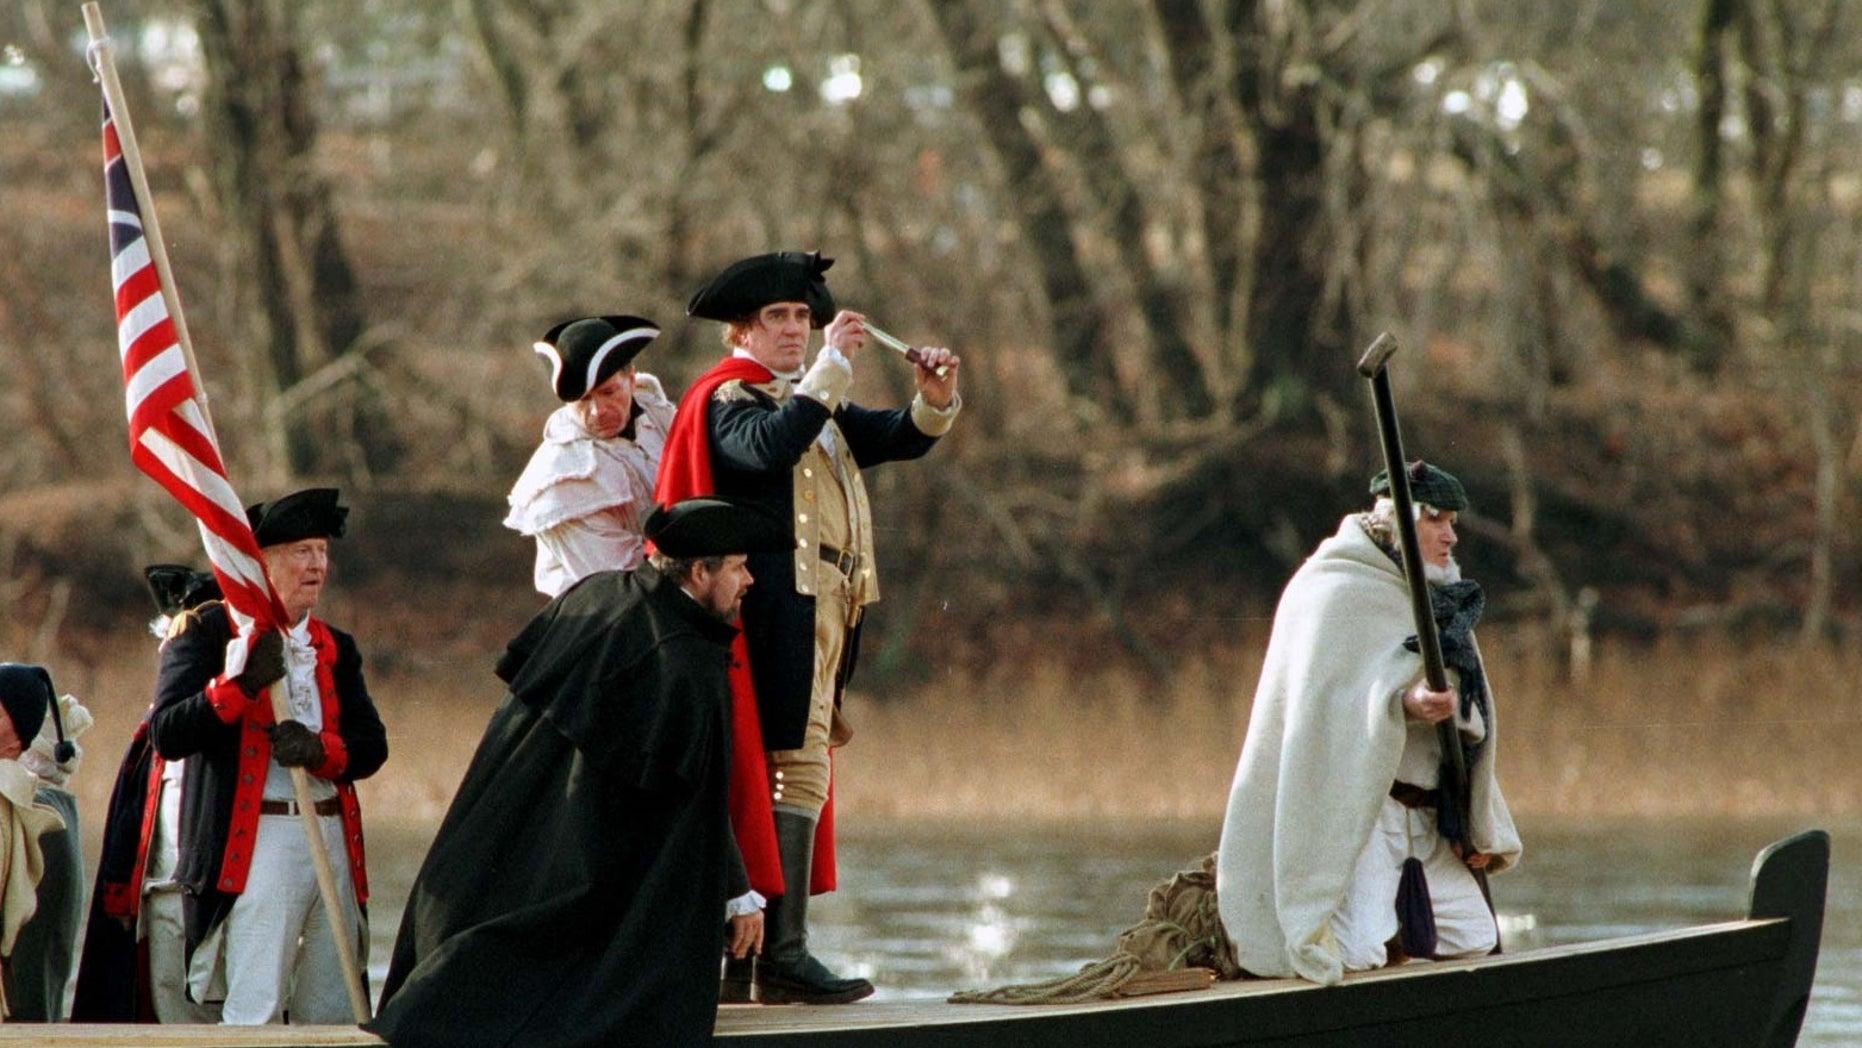 Revolutionary War reenactors cross the Delaware River between Pennsylvania and New Jersey.